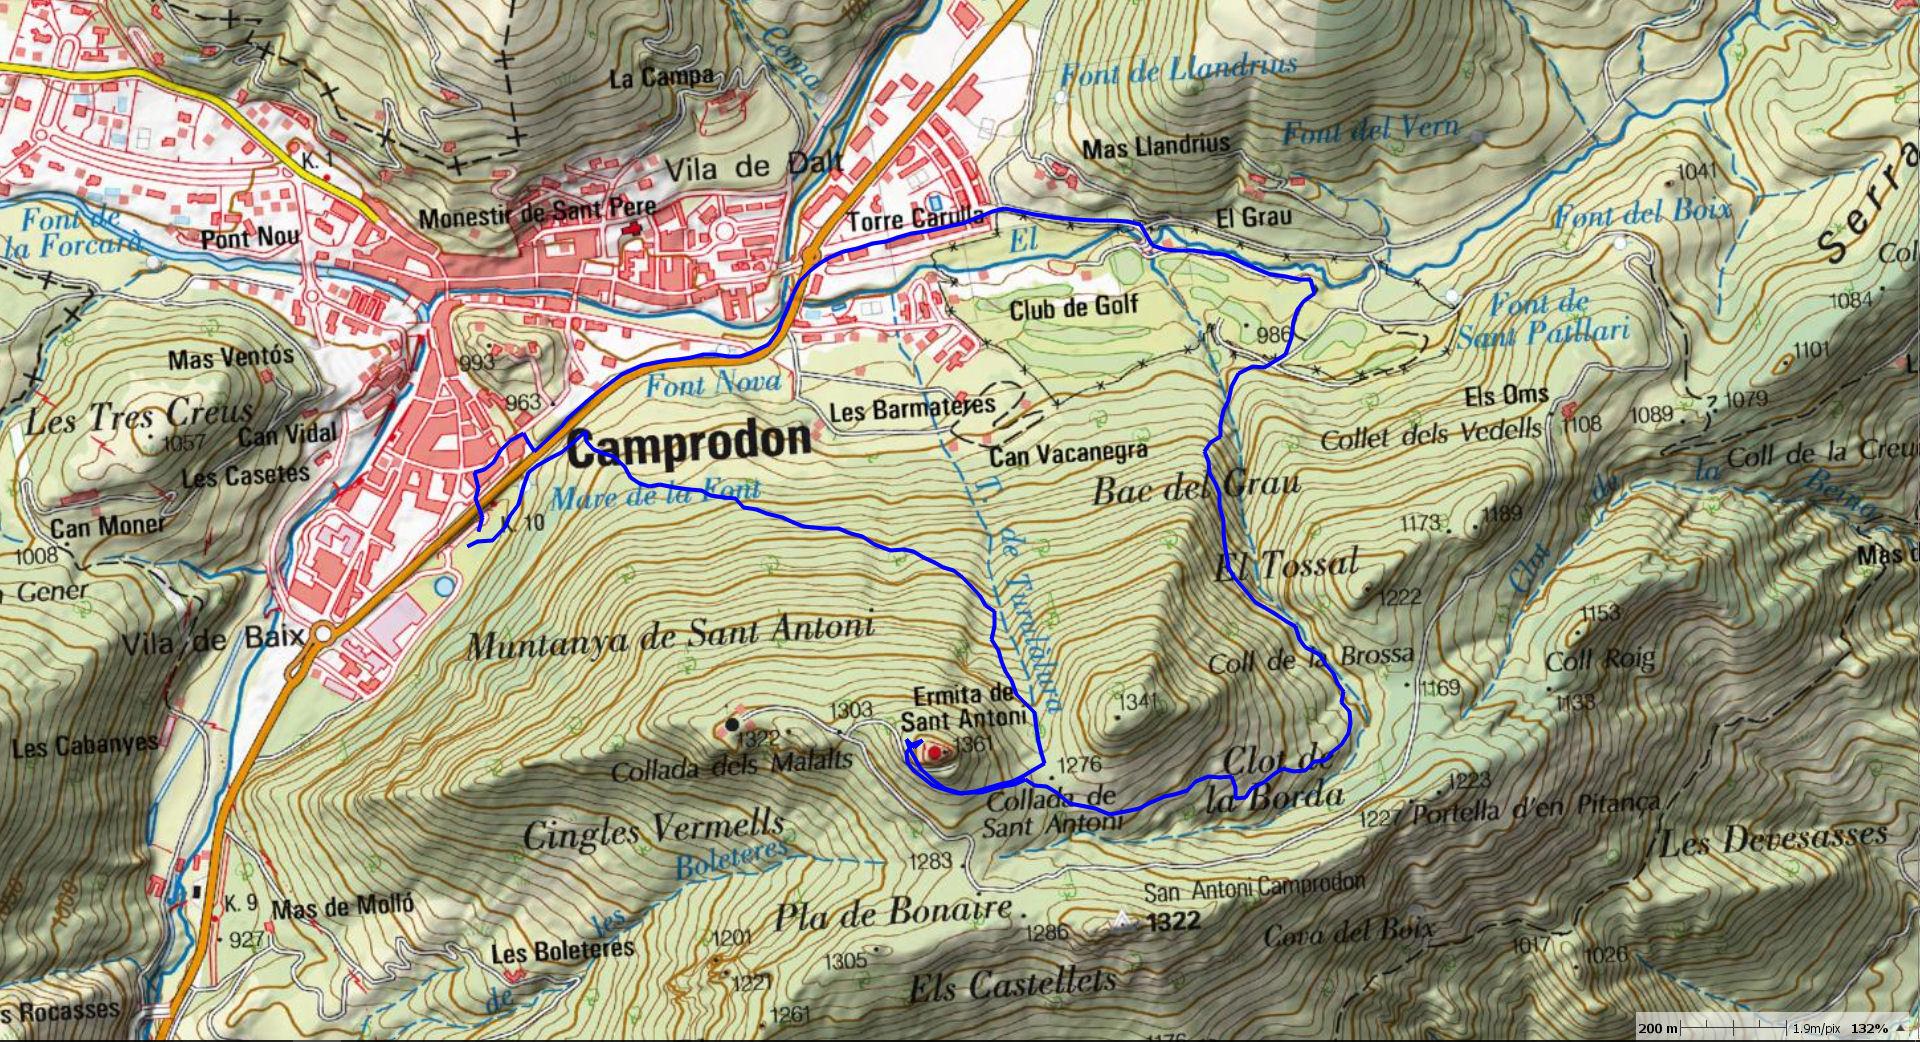 st-antoni-camprodon-map